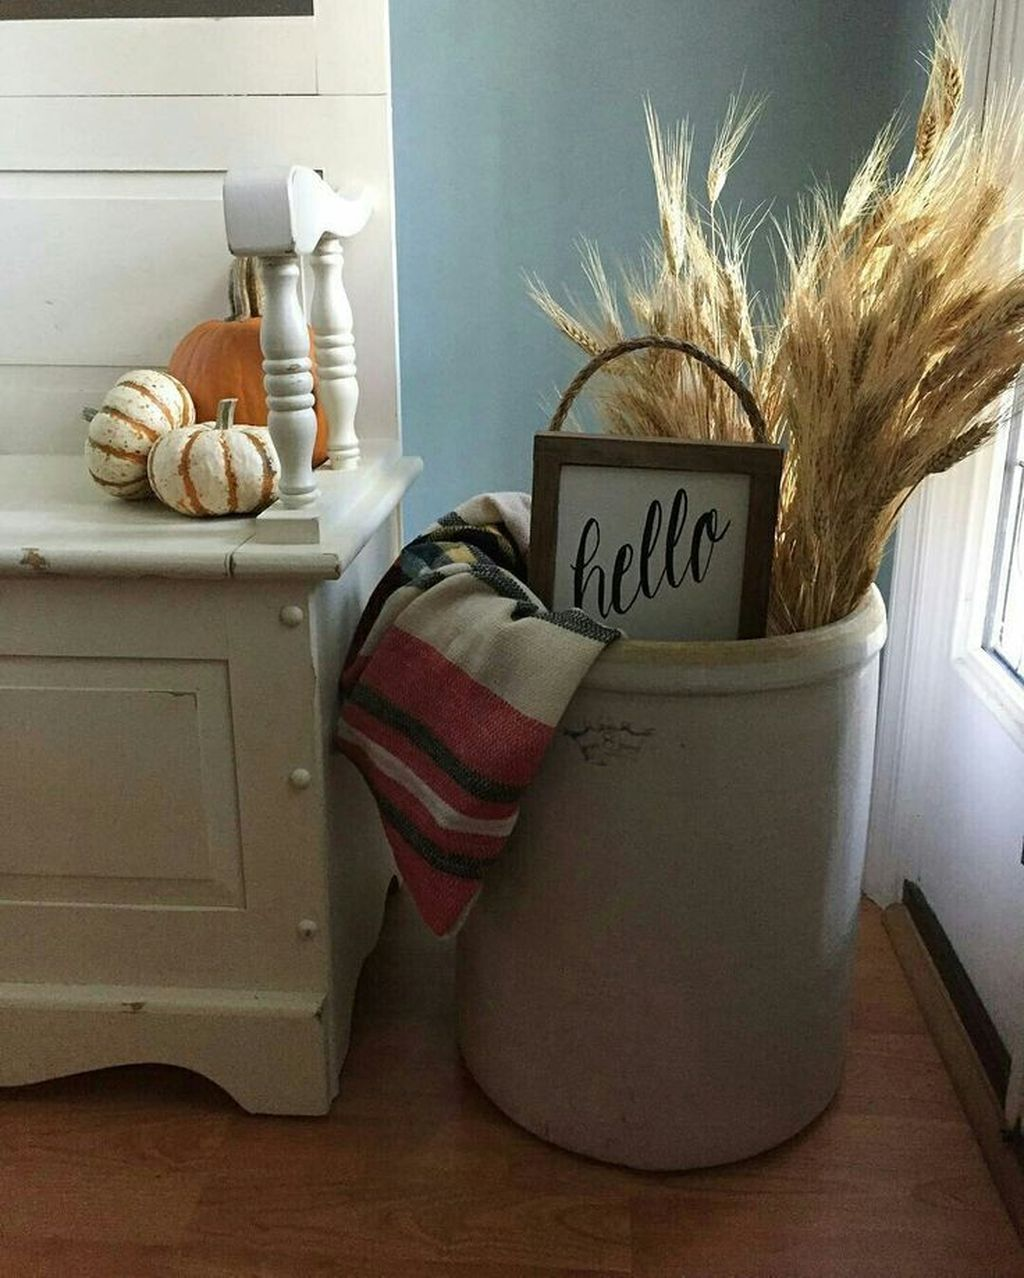 46 Awesome Farmhouse Fall Decor Ideas Perfect For Any Room Model - HOOMDESIGN #falldecor